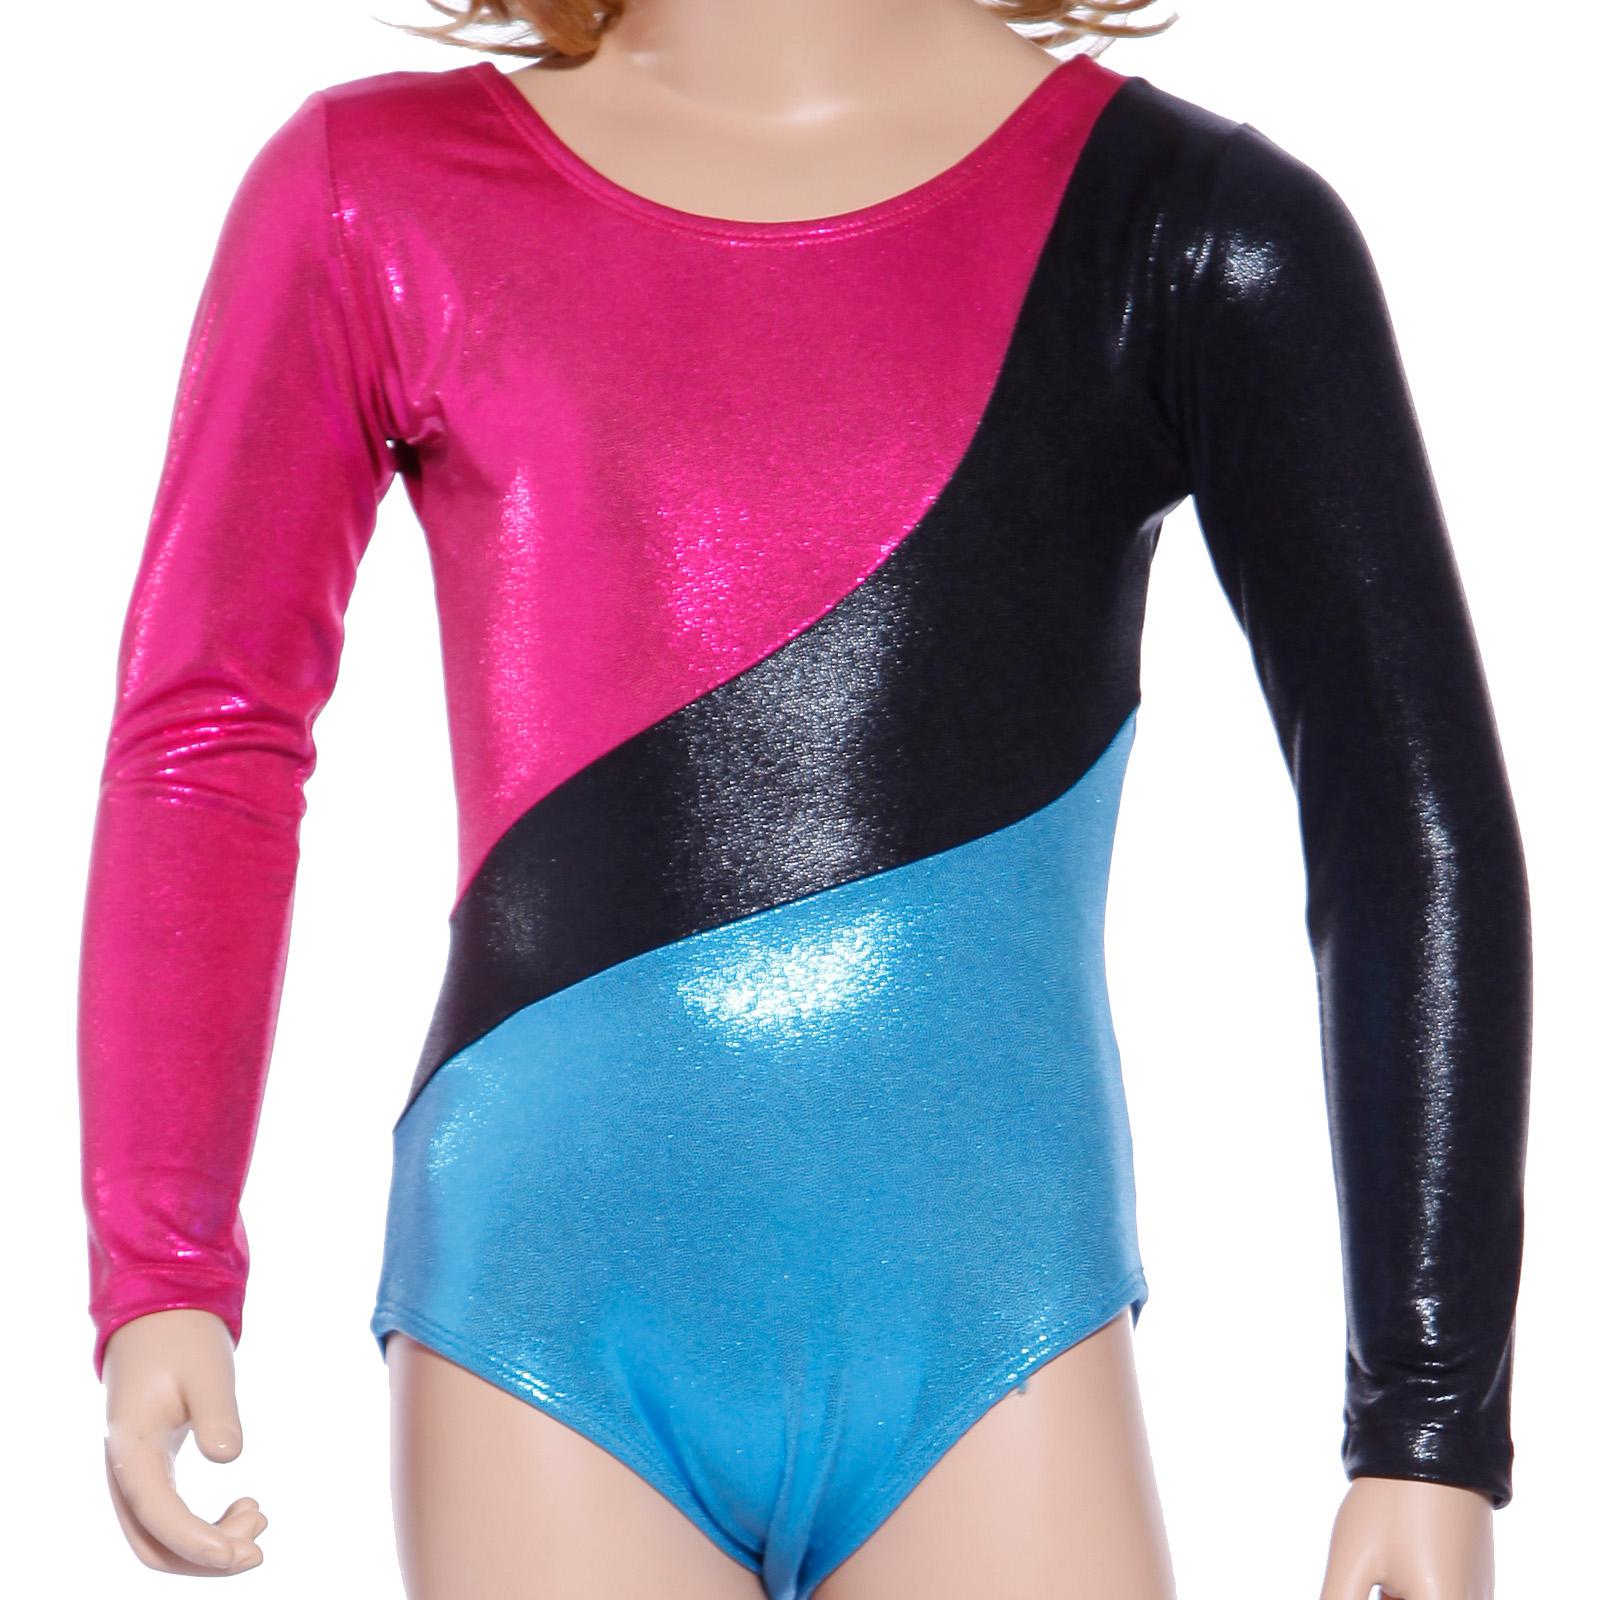 gymnastics leotards for girls amp women move dancewear - HD1600×1600